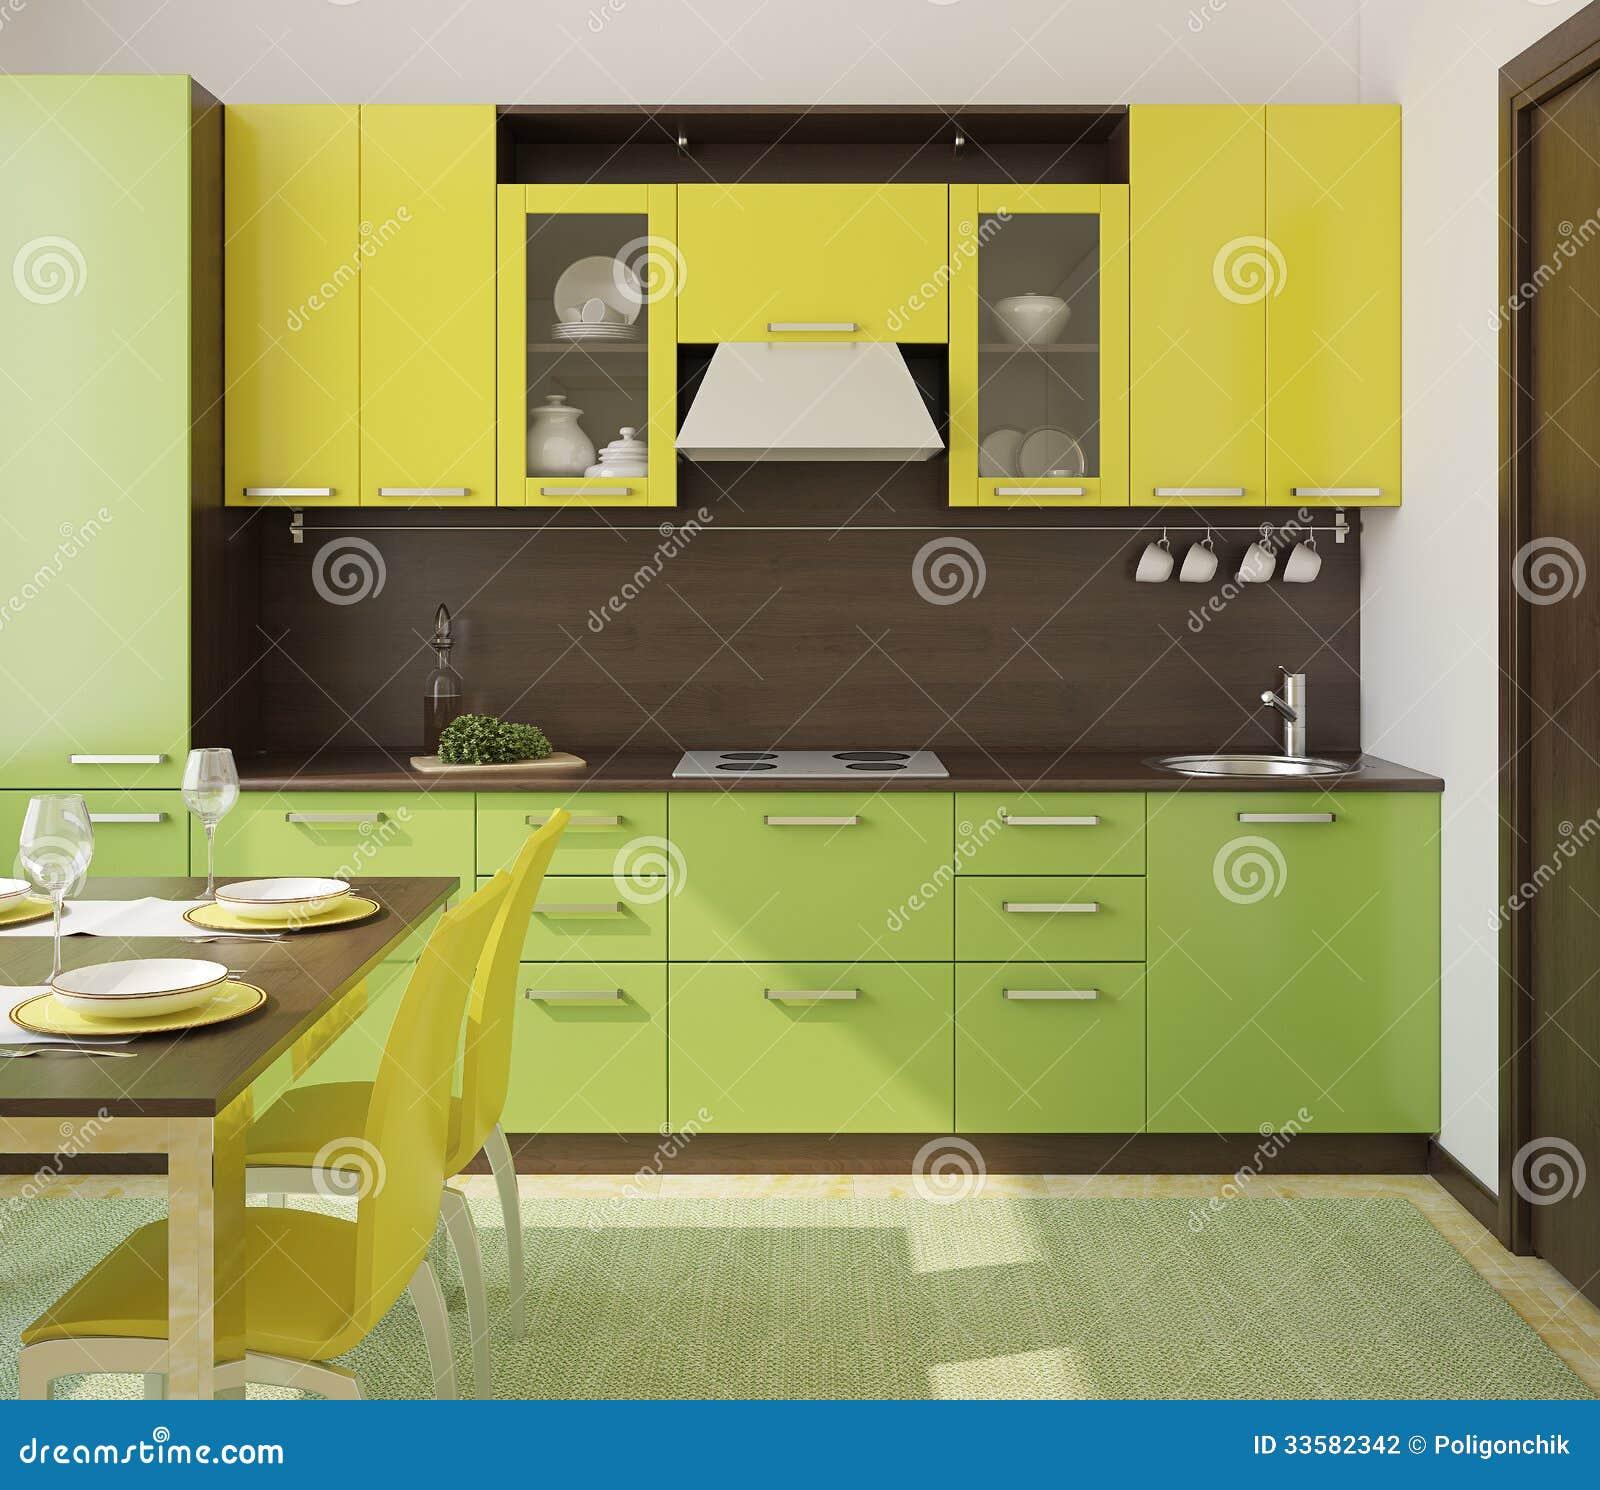 Kitchen Design Yellow Green : Modern Kitchen Interior. Stock Photography - Image: 33582342